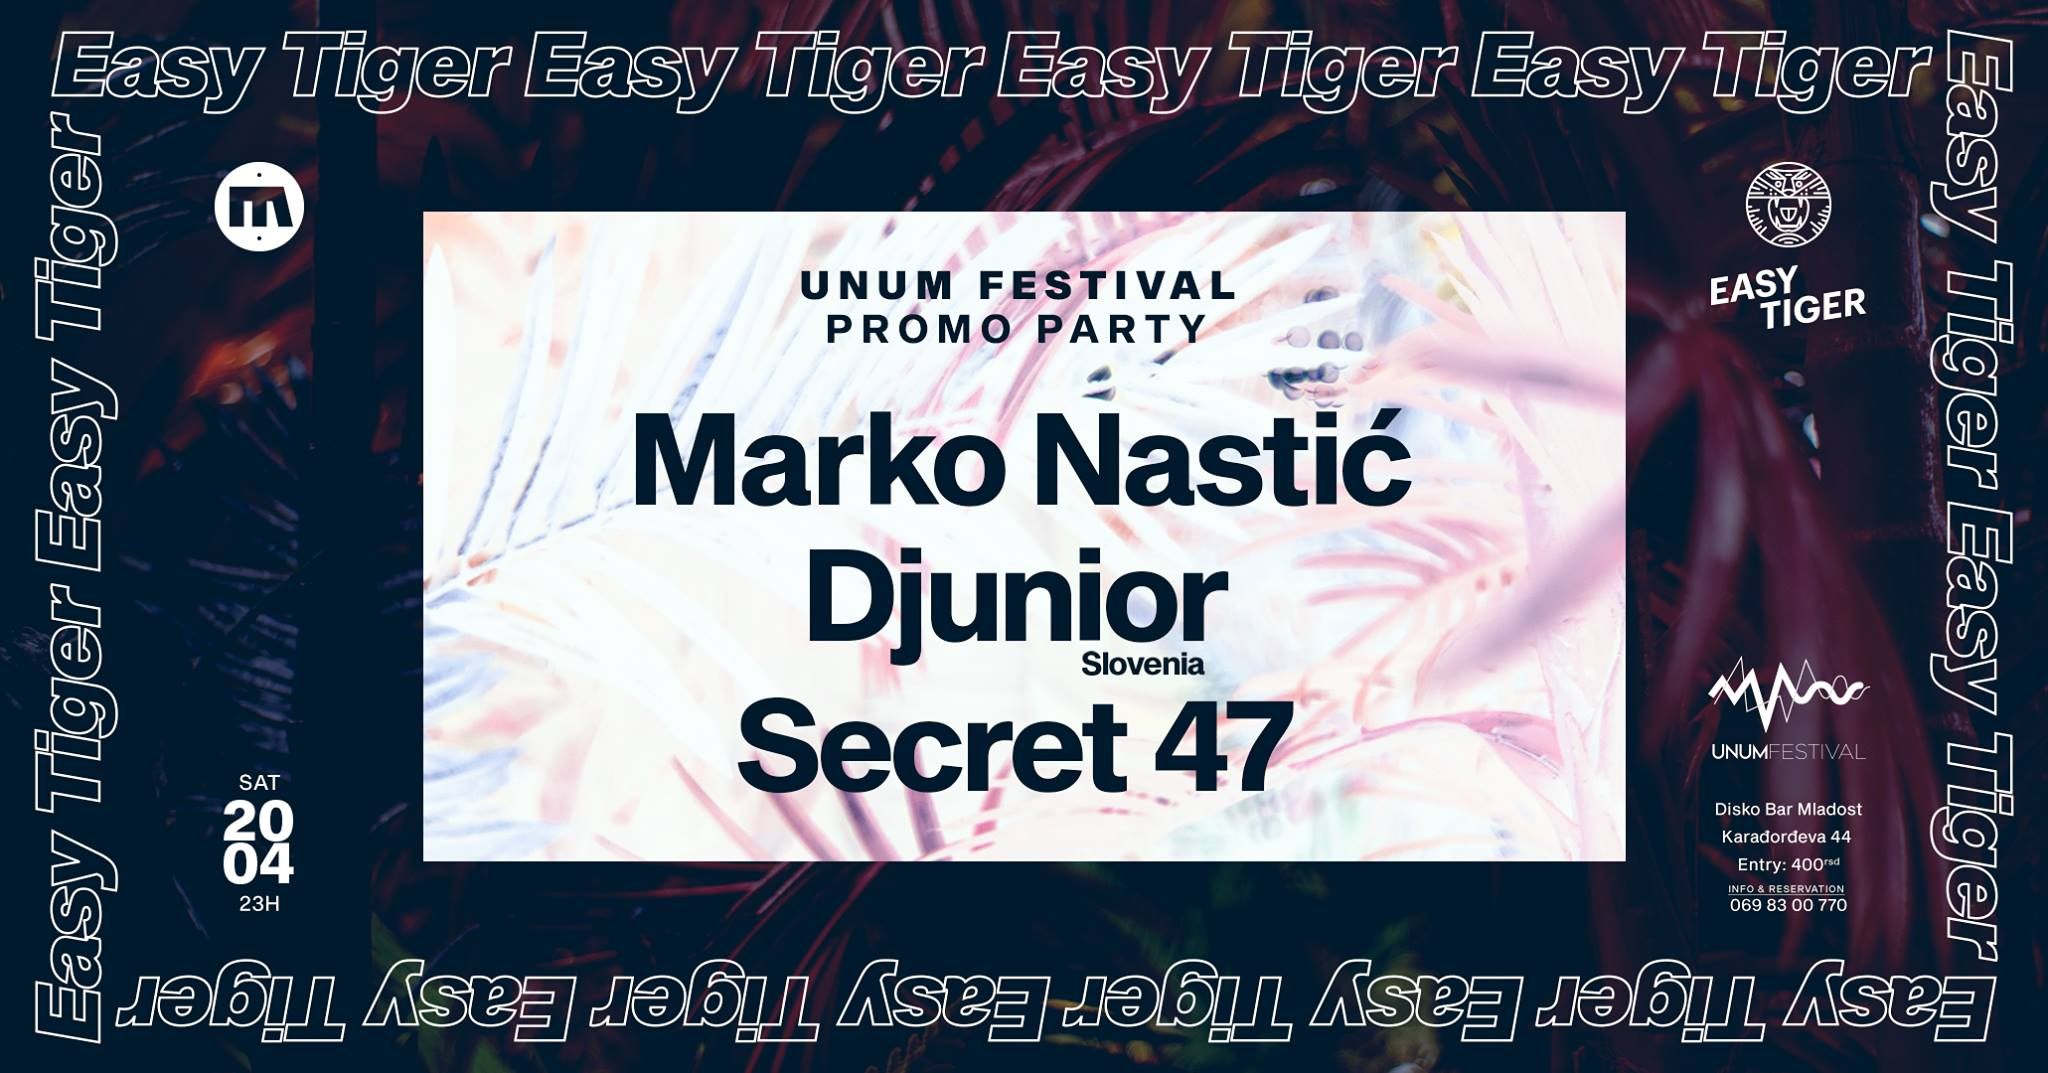 UNUM Pre-Party in Belgrade w/ Marko Nastic, Djunior & Secret 47